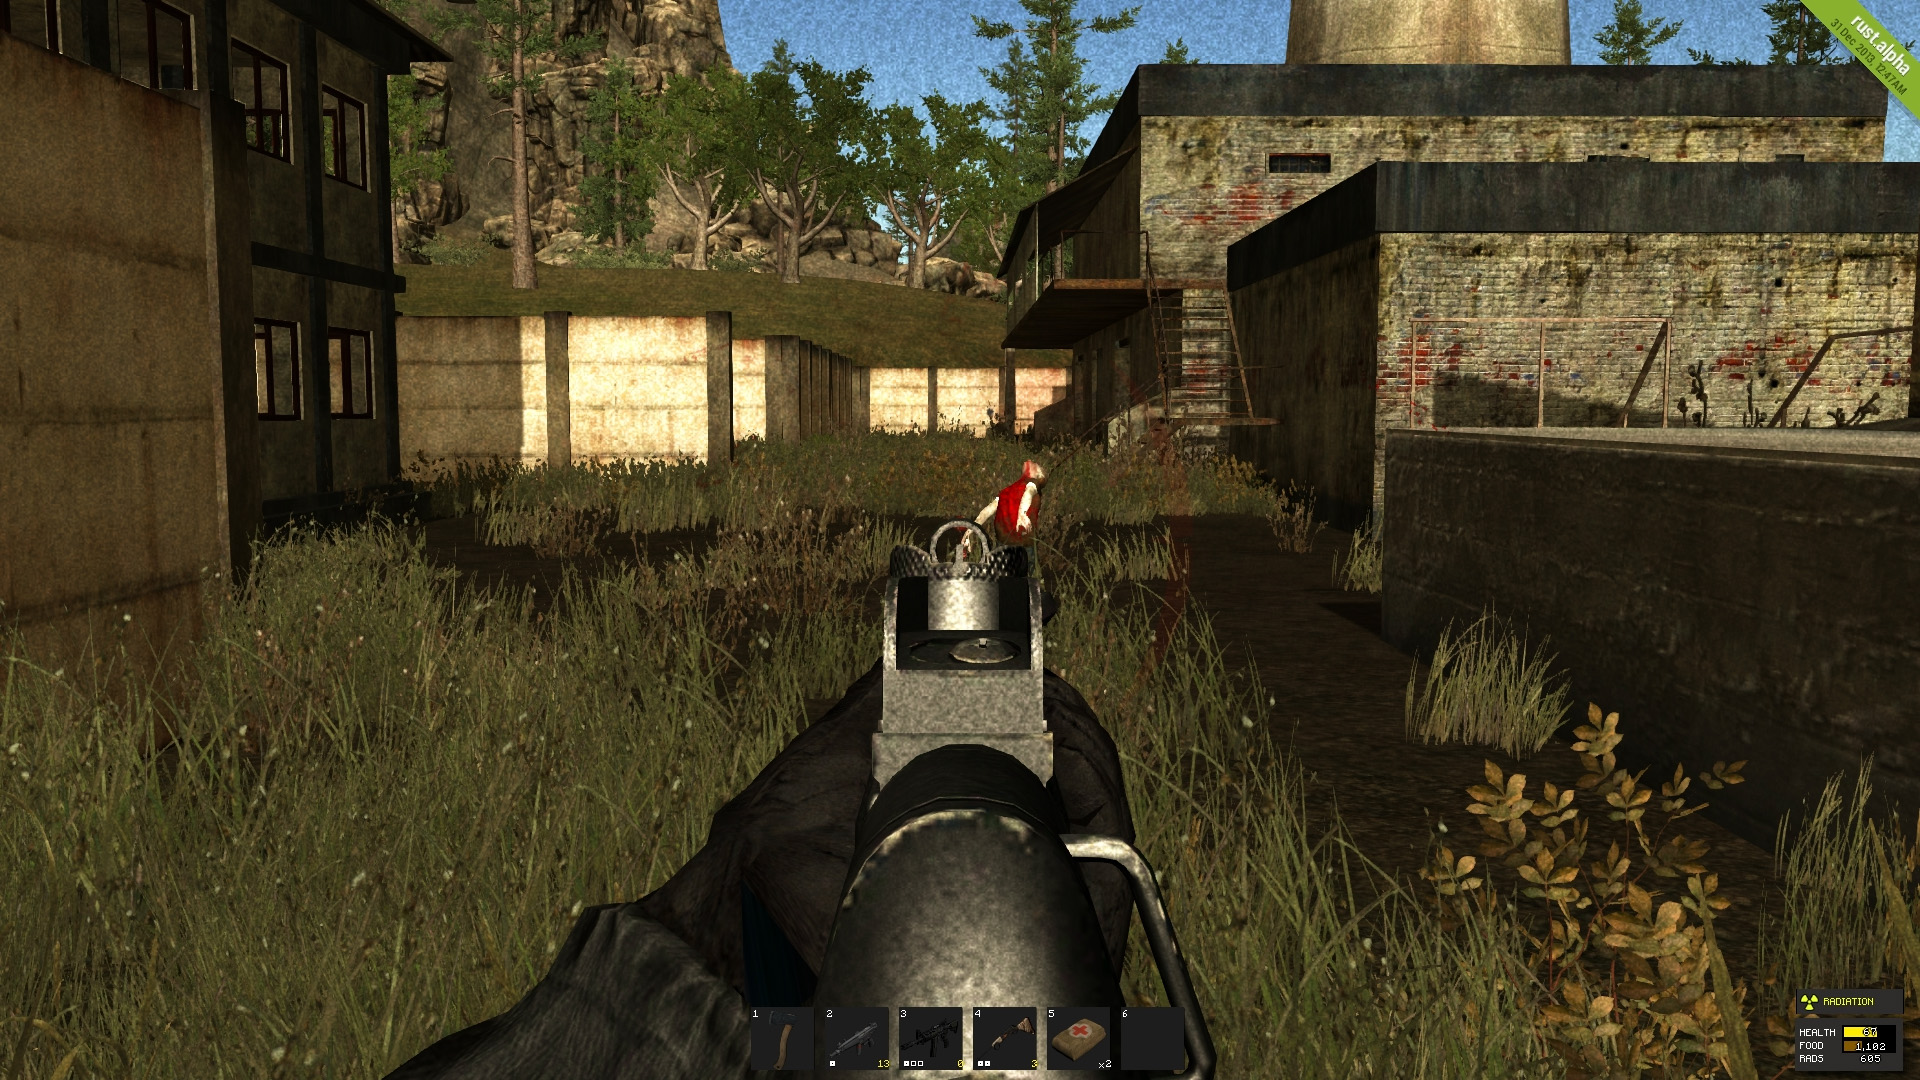 Go ahead using Rust Cheat in modern games